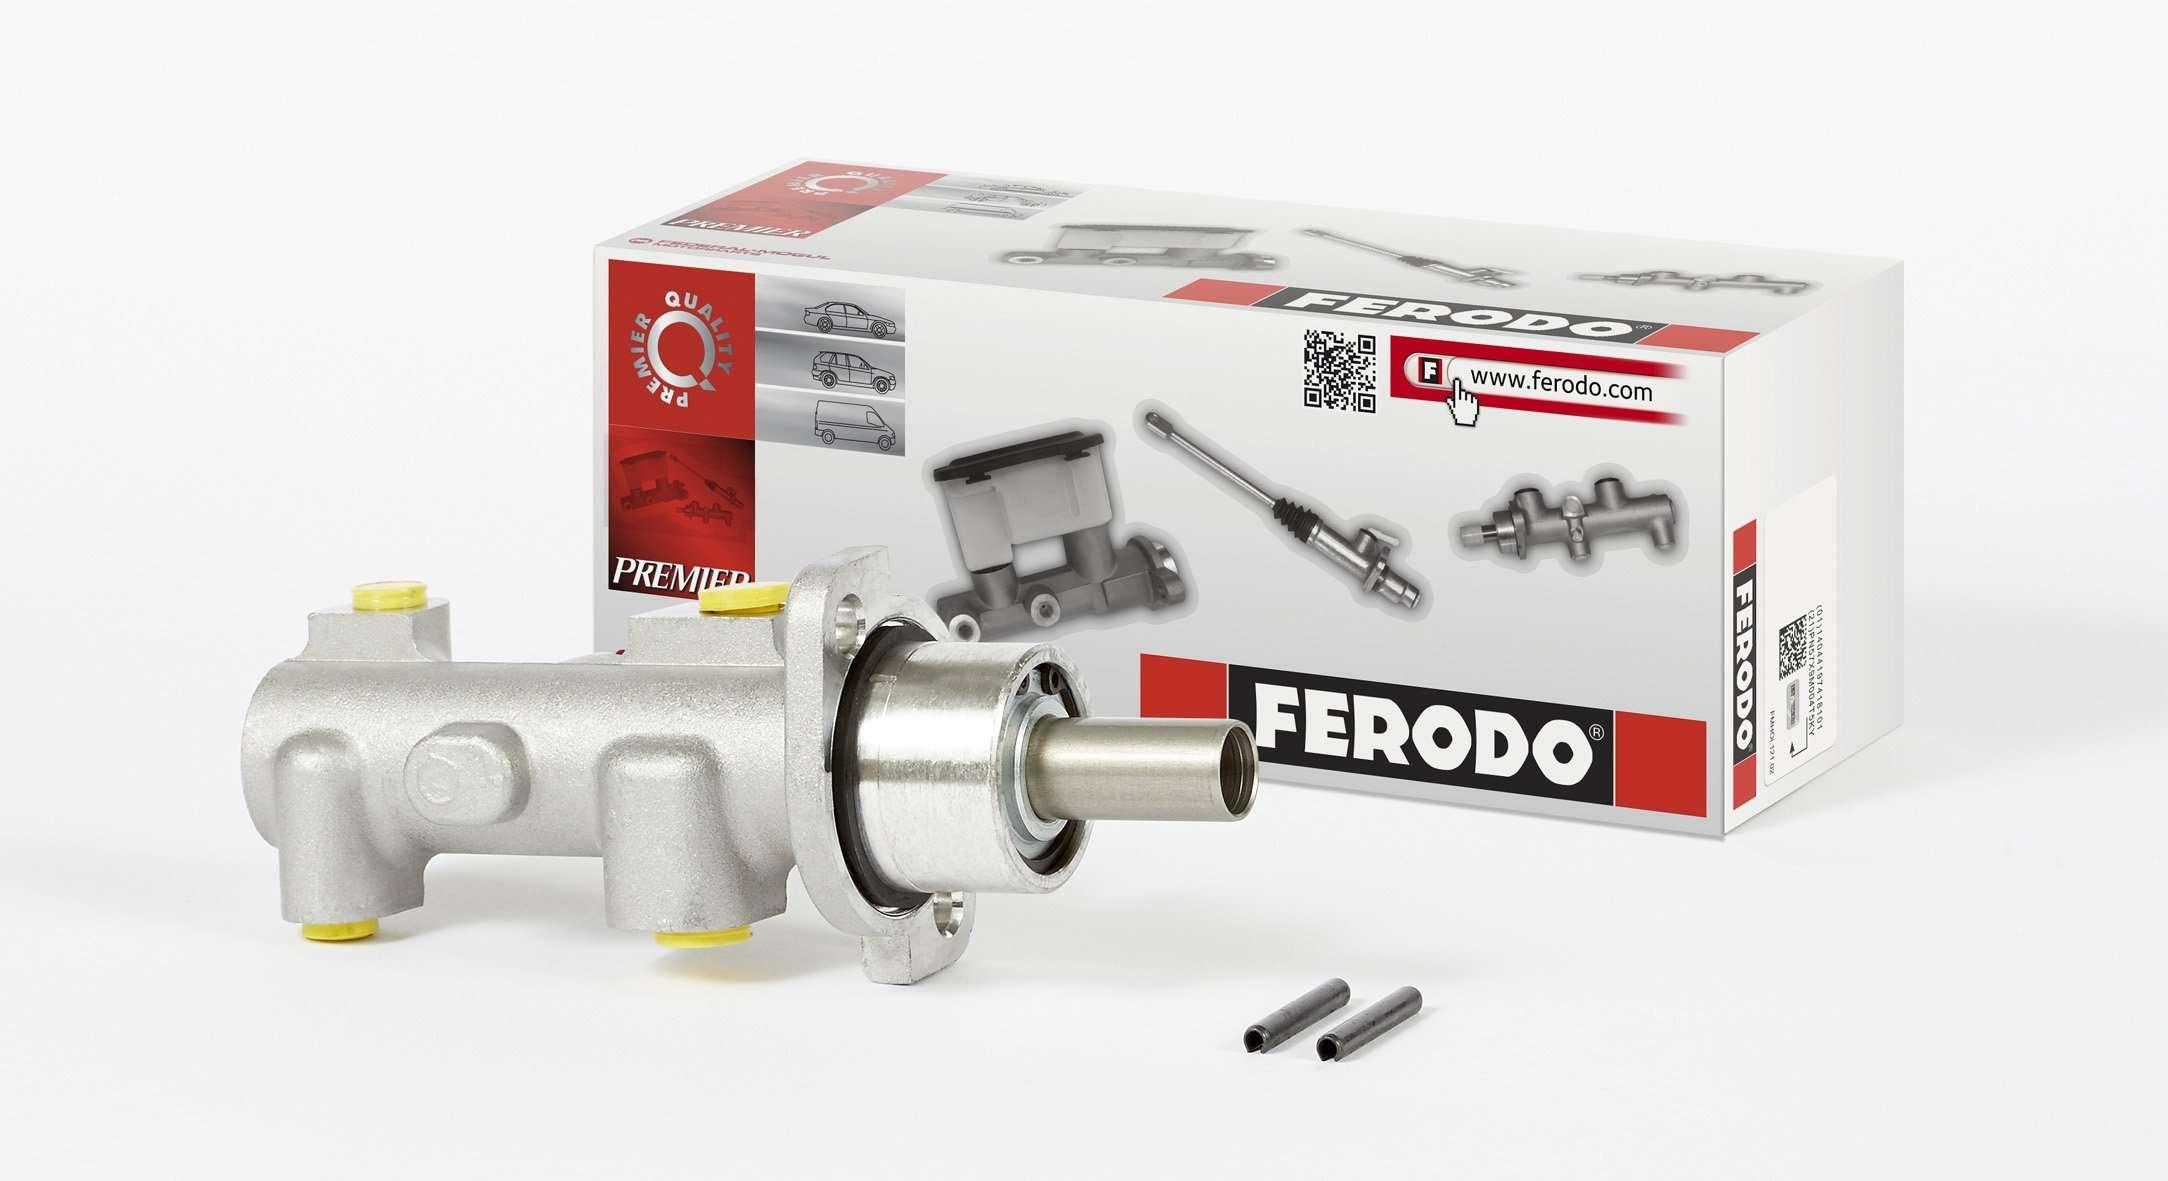 Ferodo_Pompe freno